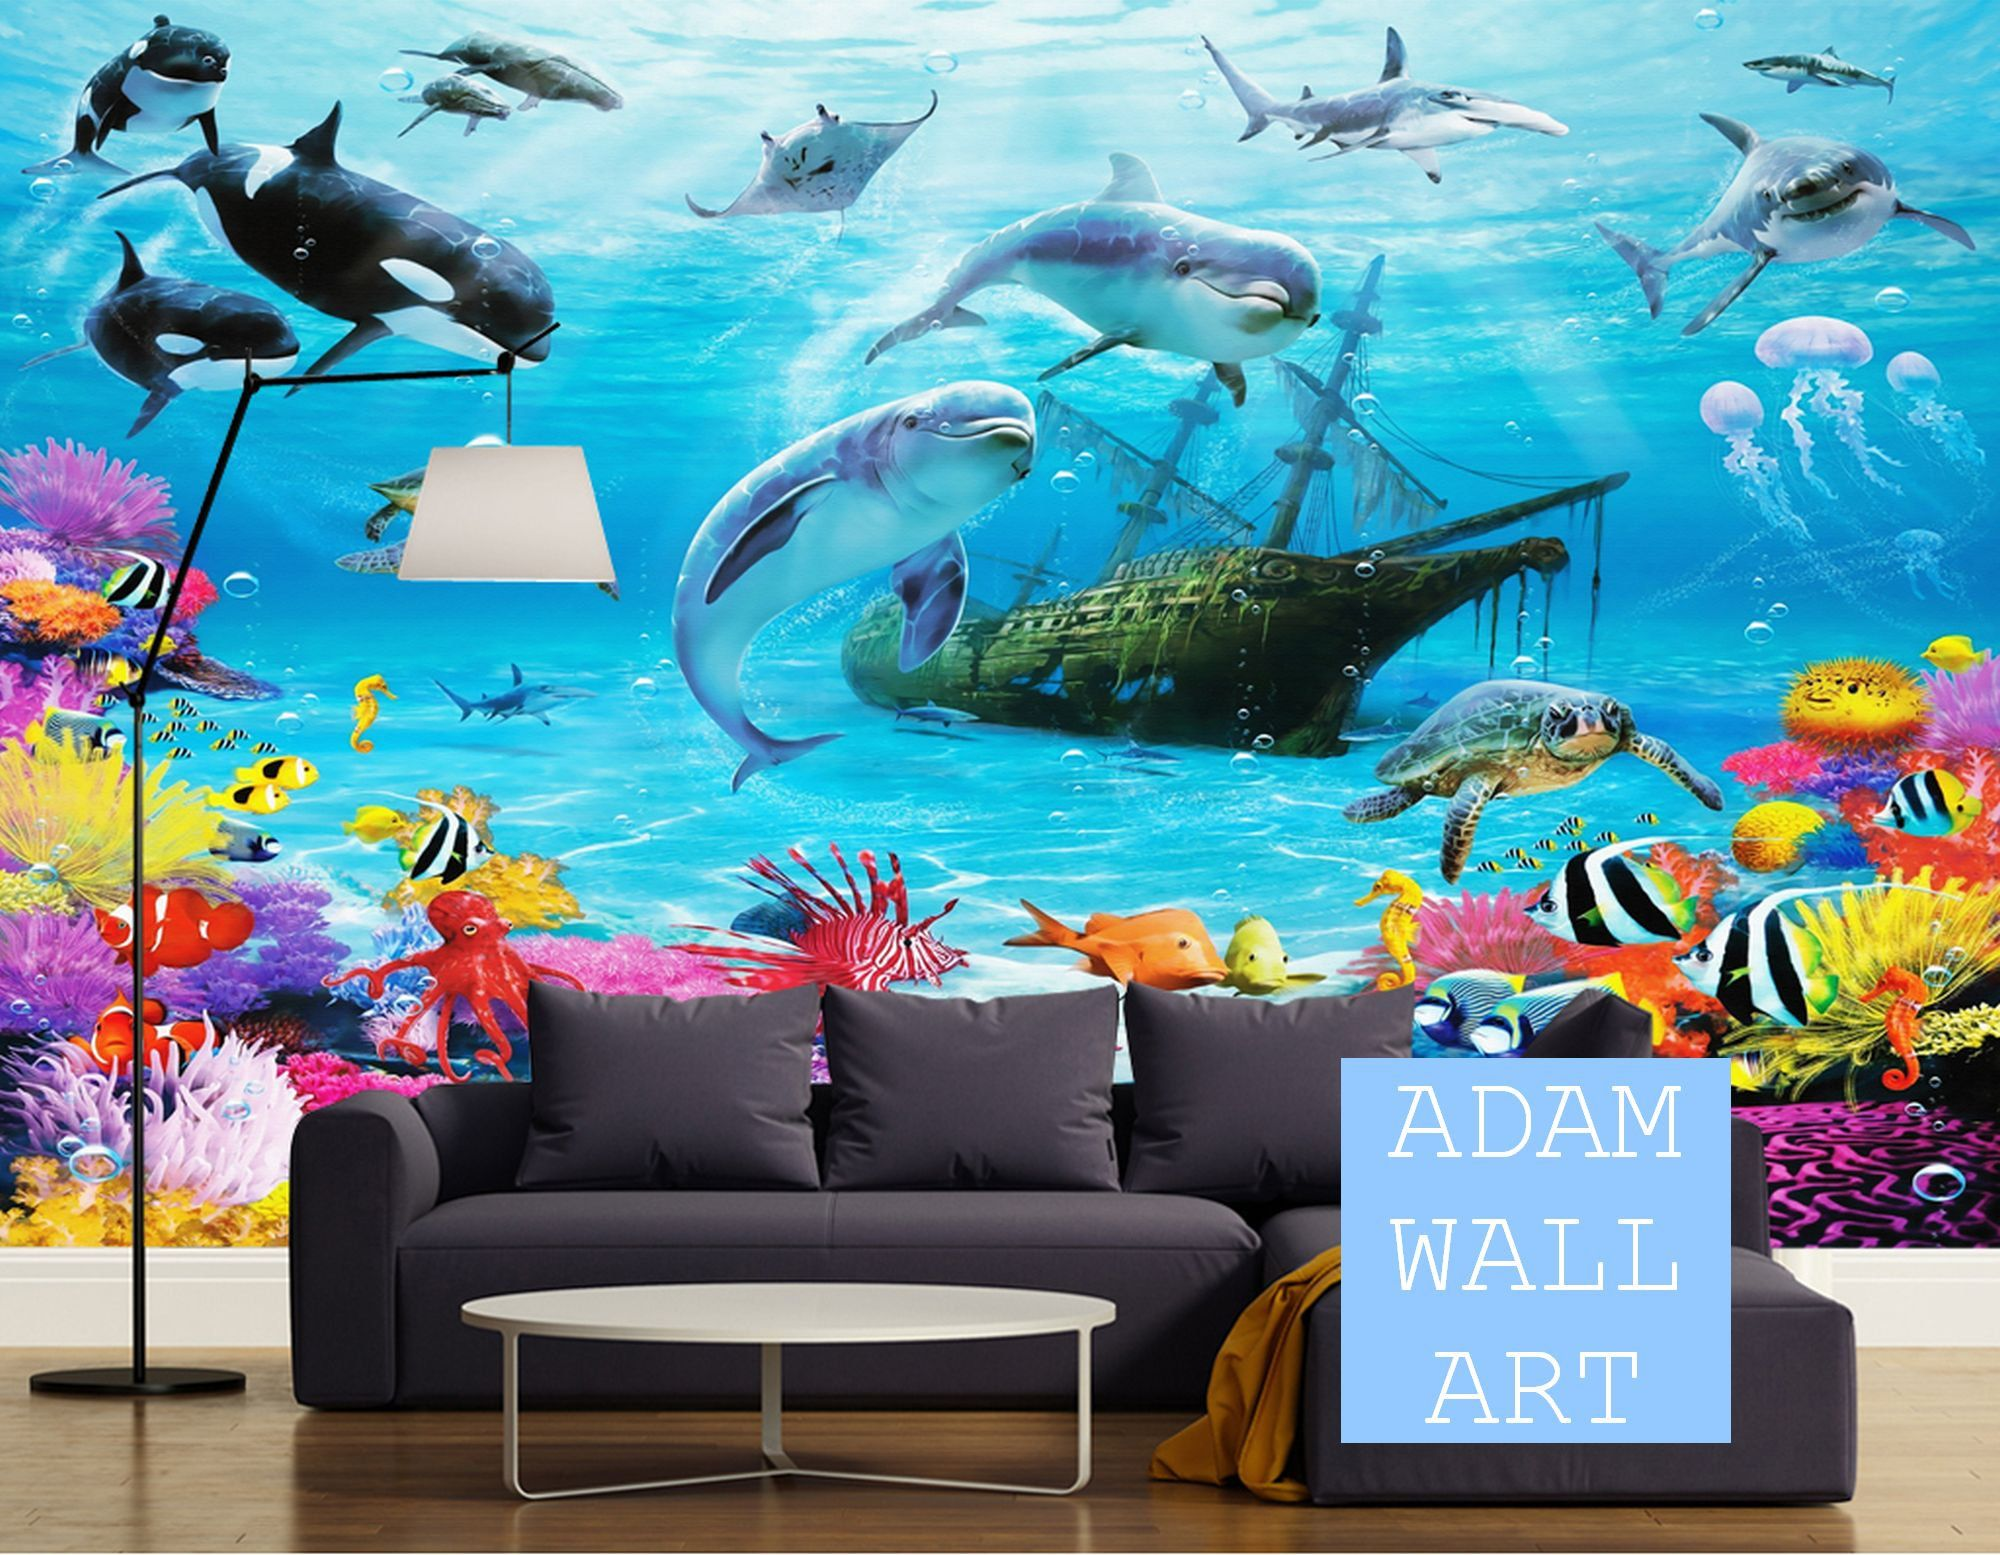 Hot Air Baloon Plane Nursery And Child Room Wallpaper Wall Etsy In 2021 Mural Wallpaper Wallpaper Mural Art 3d wallpaper kids room